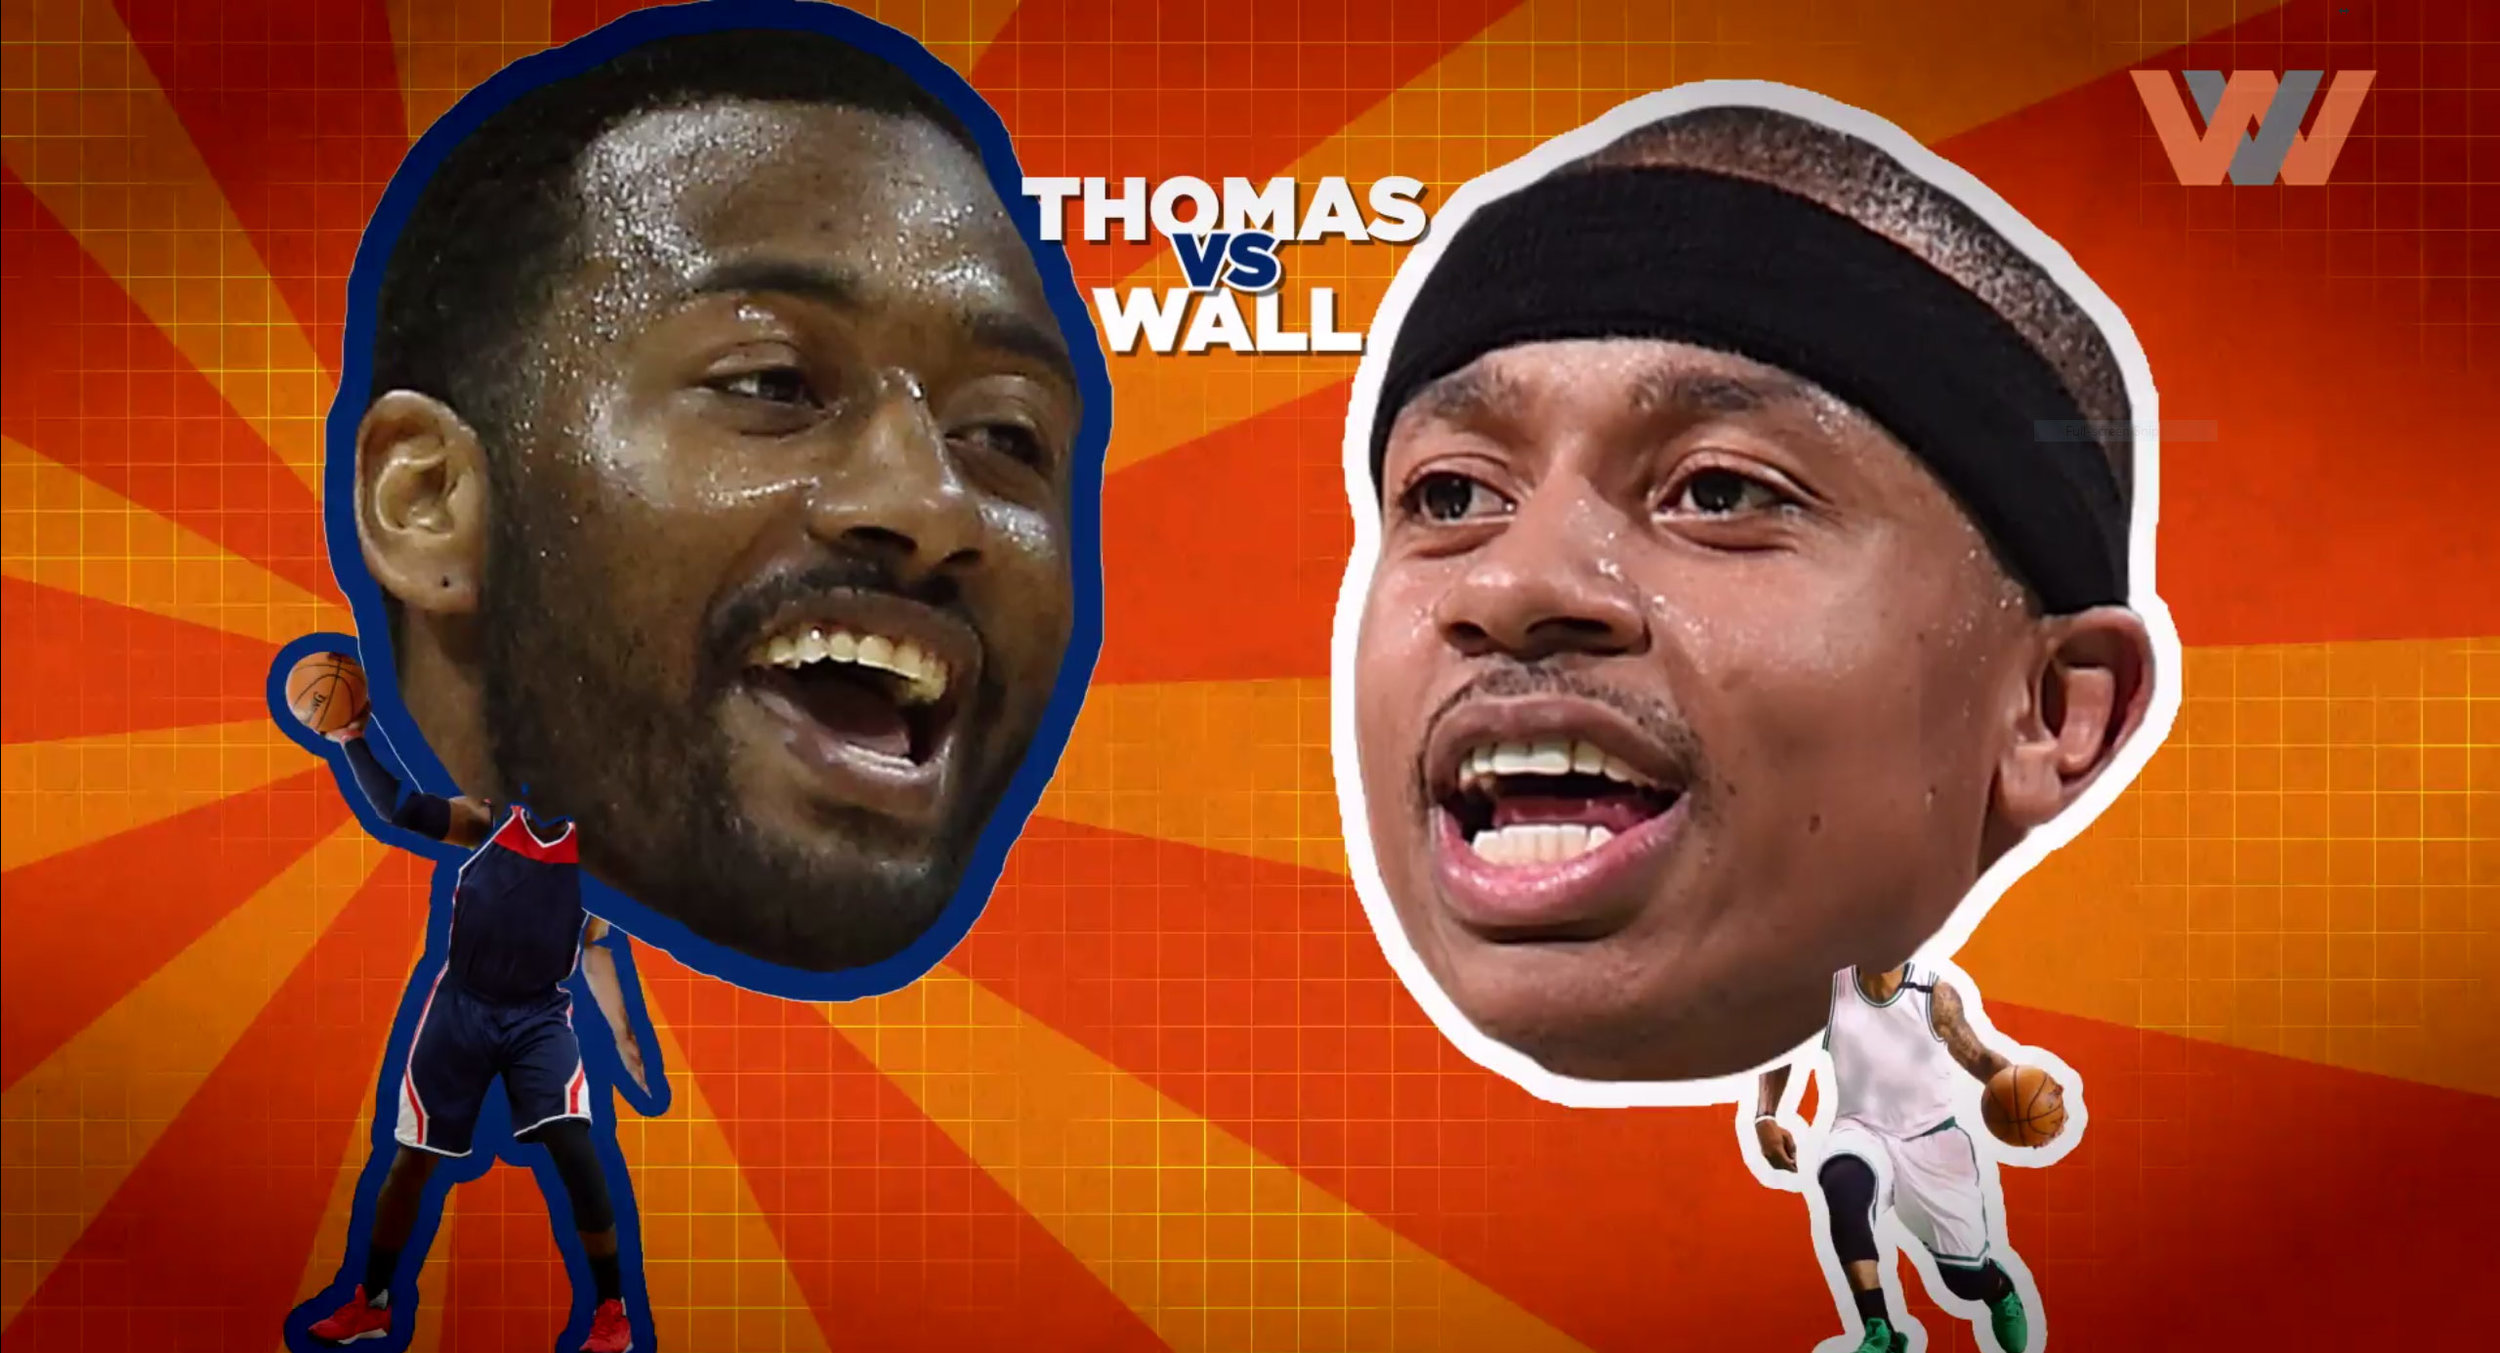 John Wall Vs. Isaiah Thomas: Who's Better? - Winnersview.com